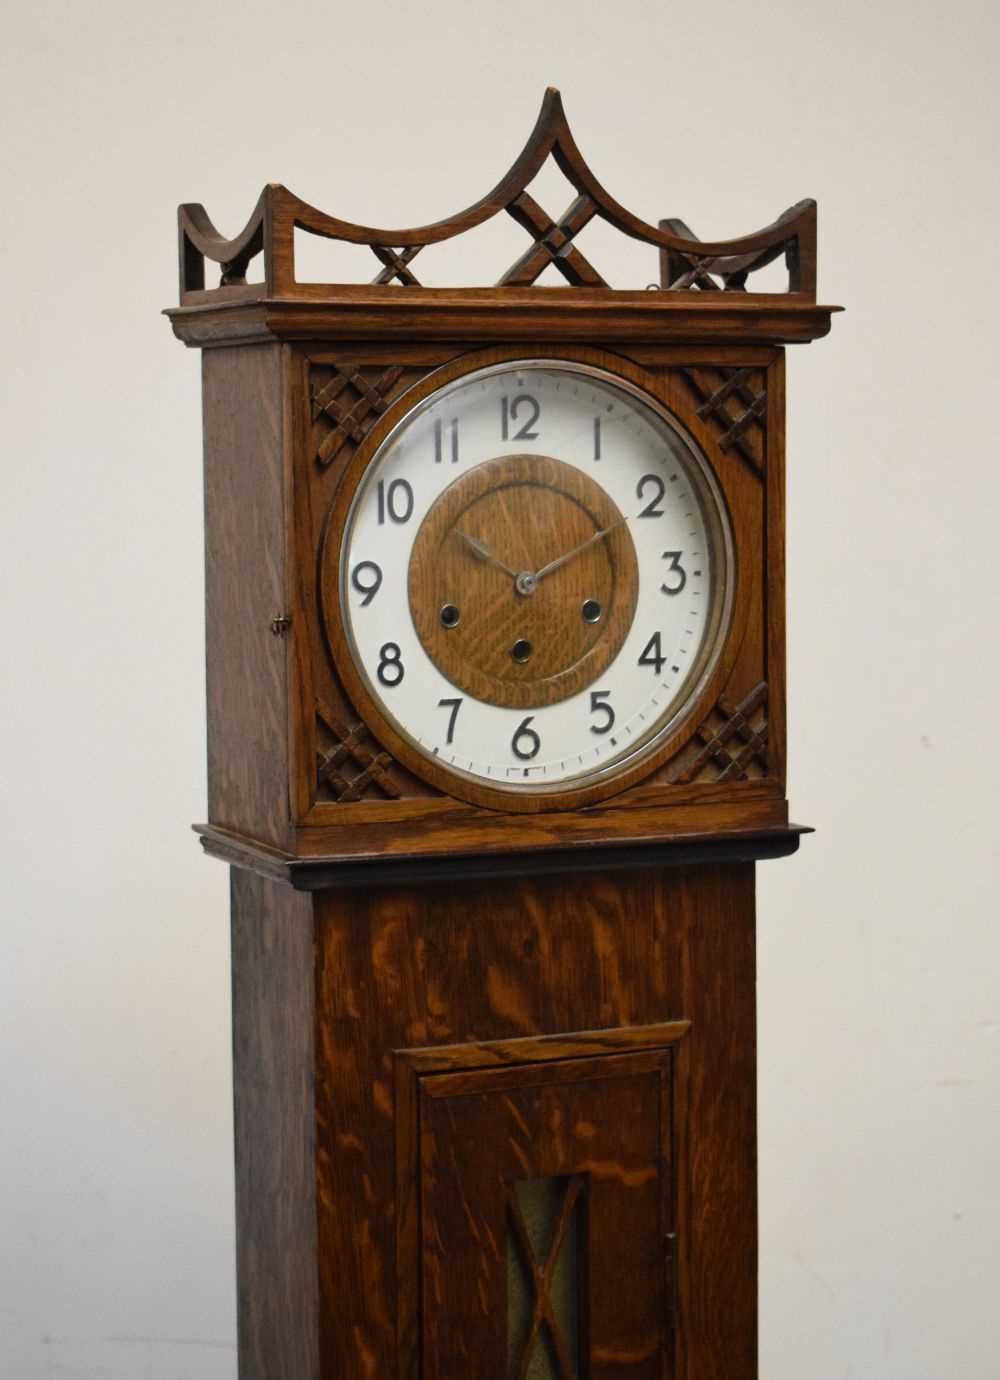 Early 20th Century oak-cased grandmother clock